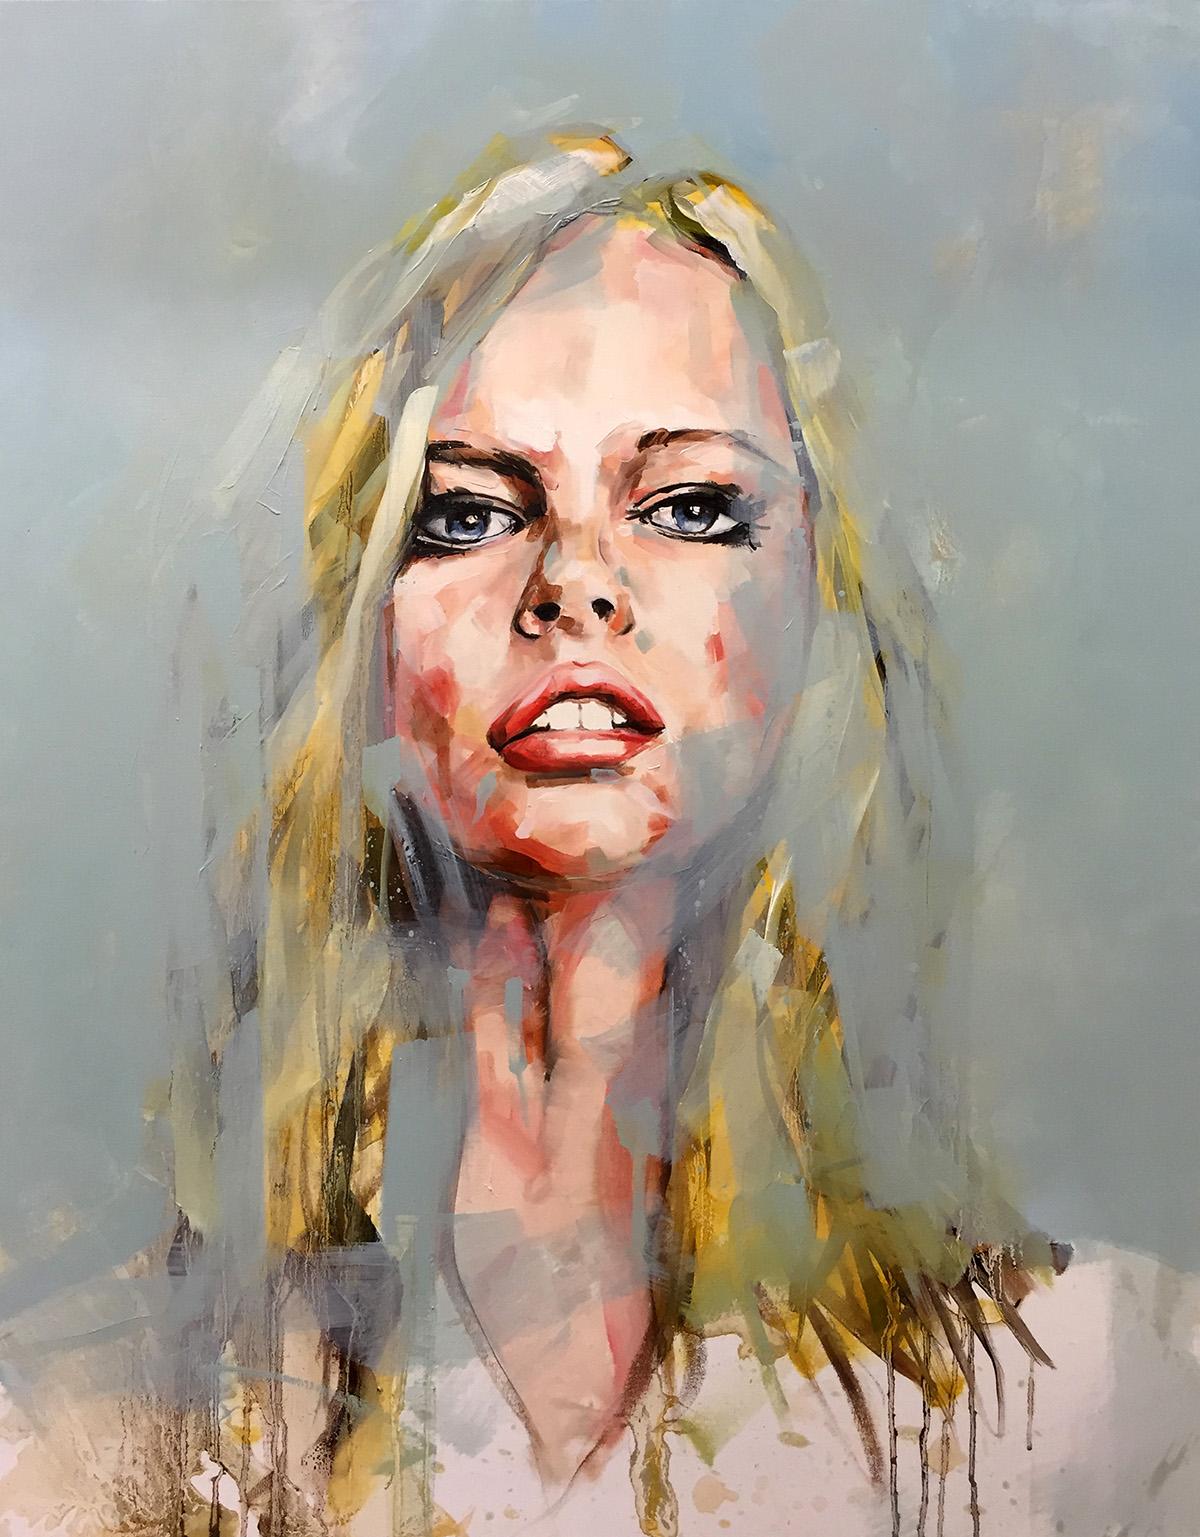 Camouflage Portrait Painting